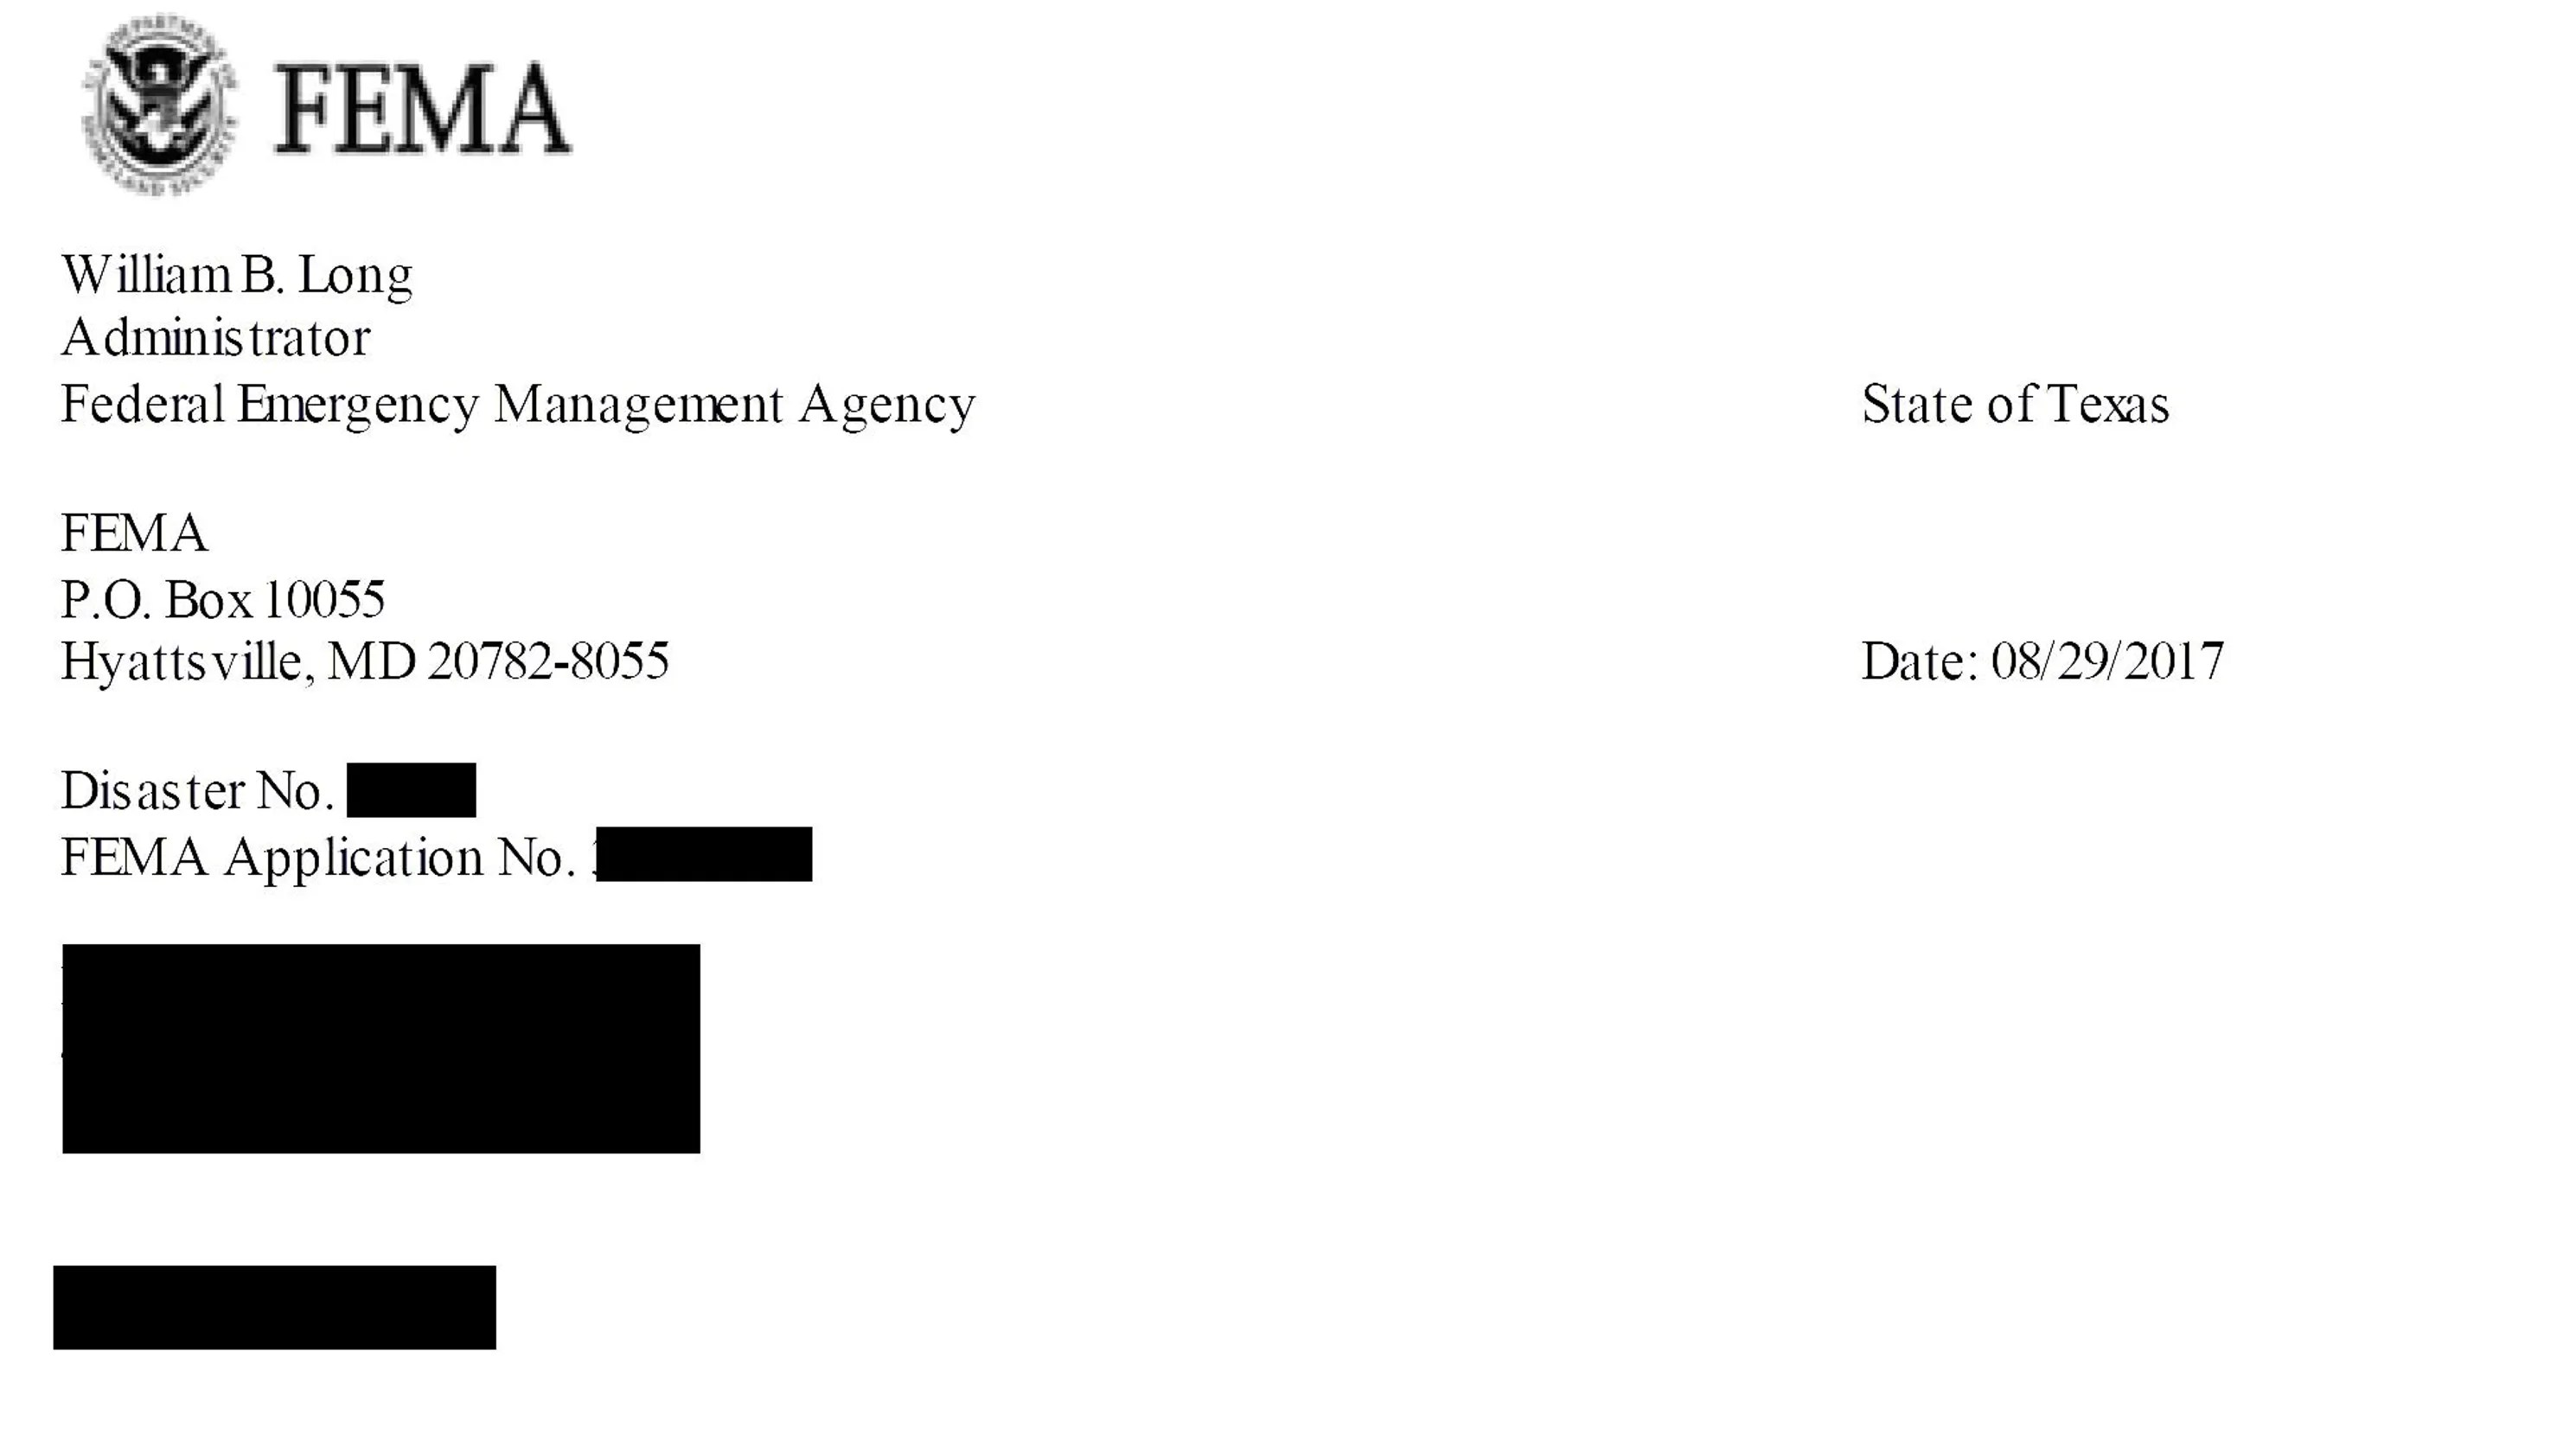 Denied by FEMA? Let's break down the application process